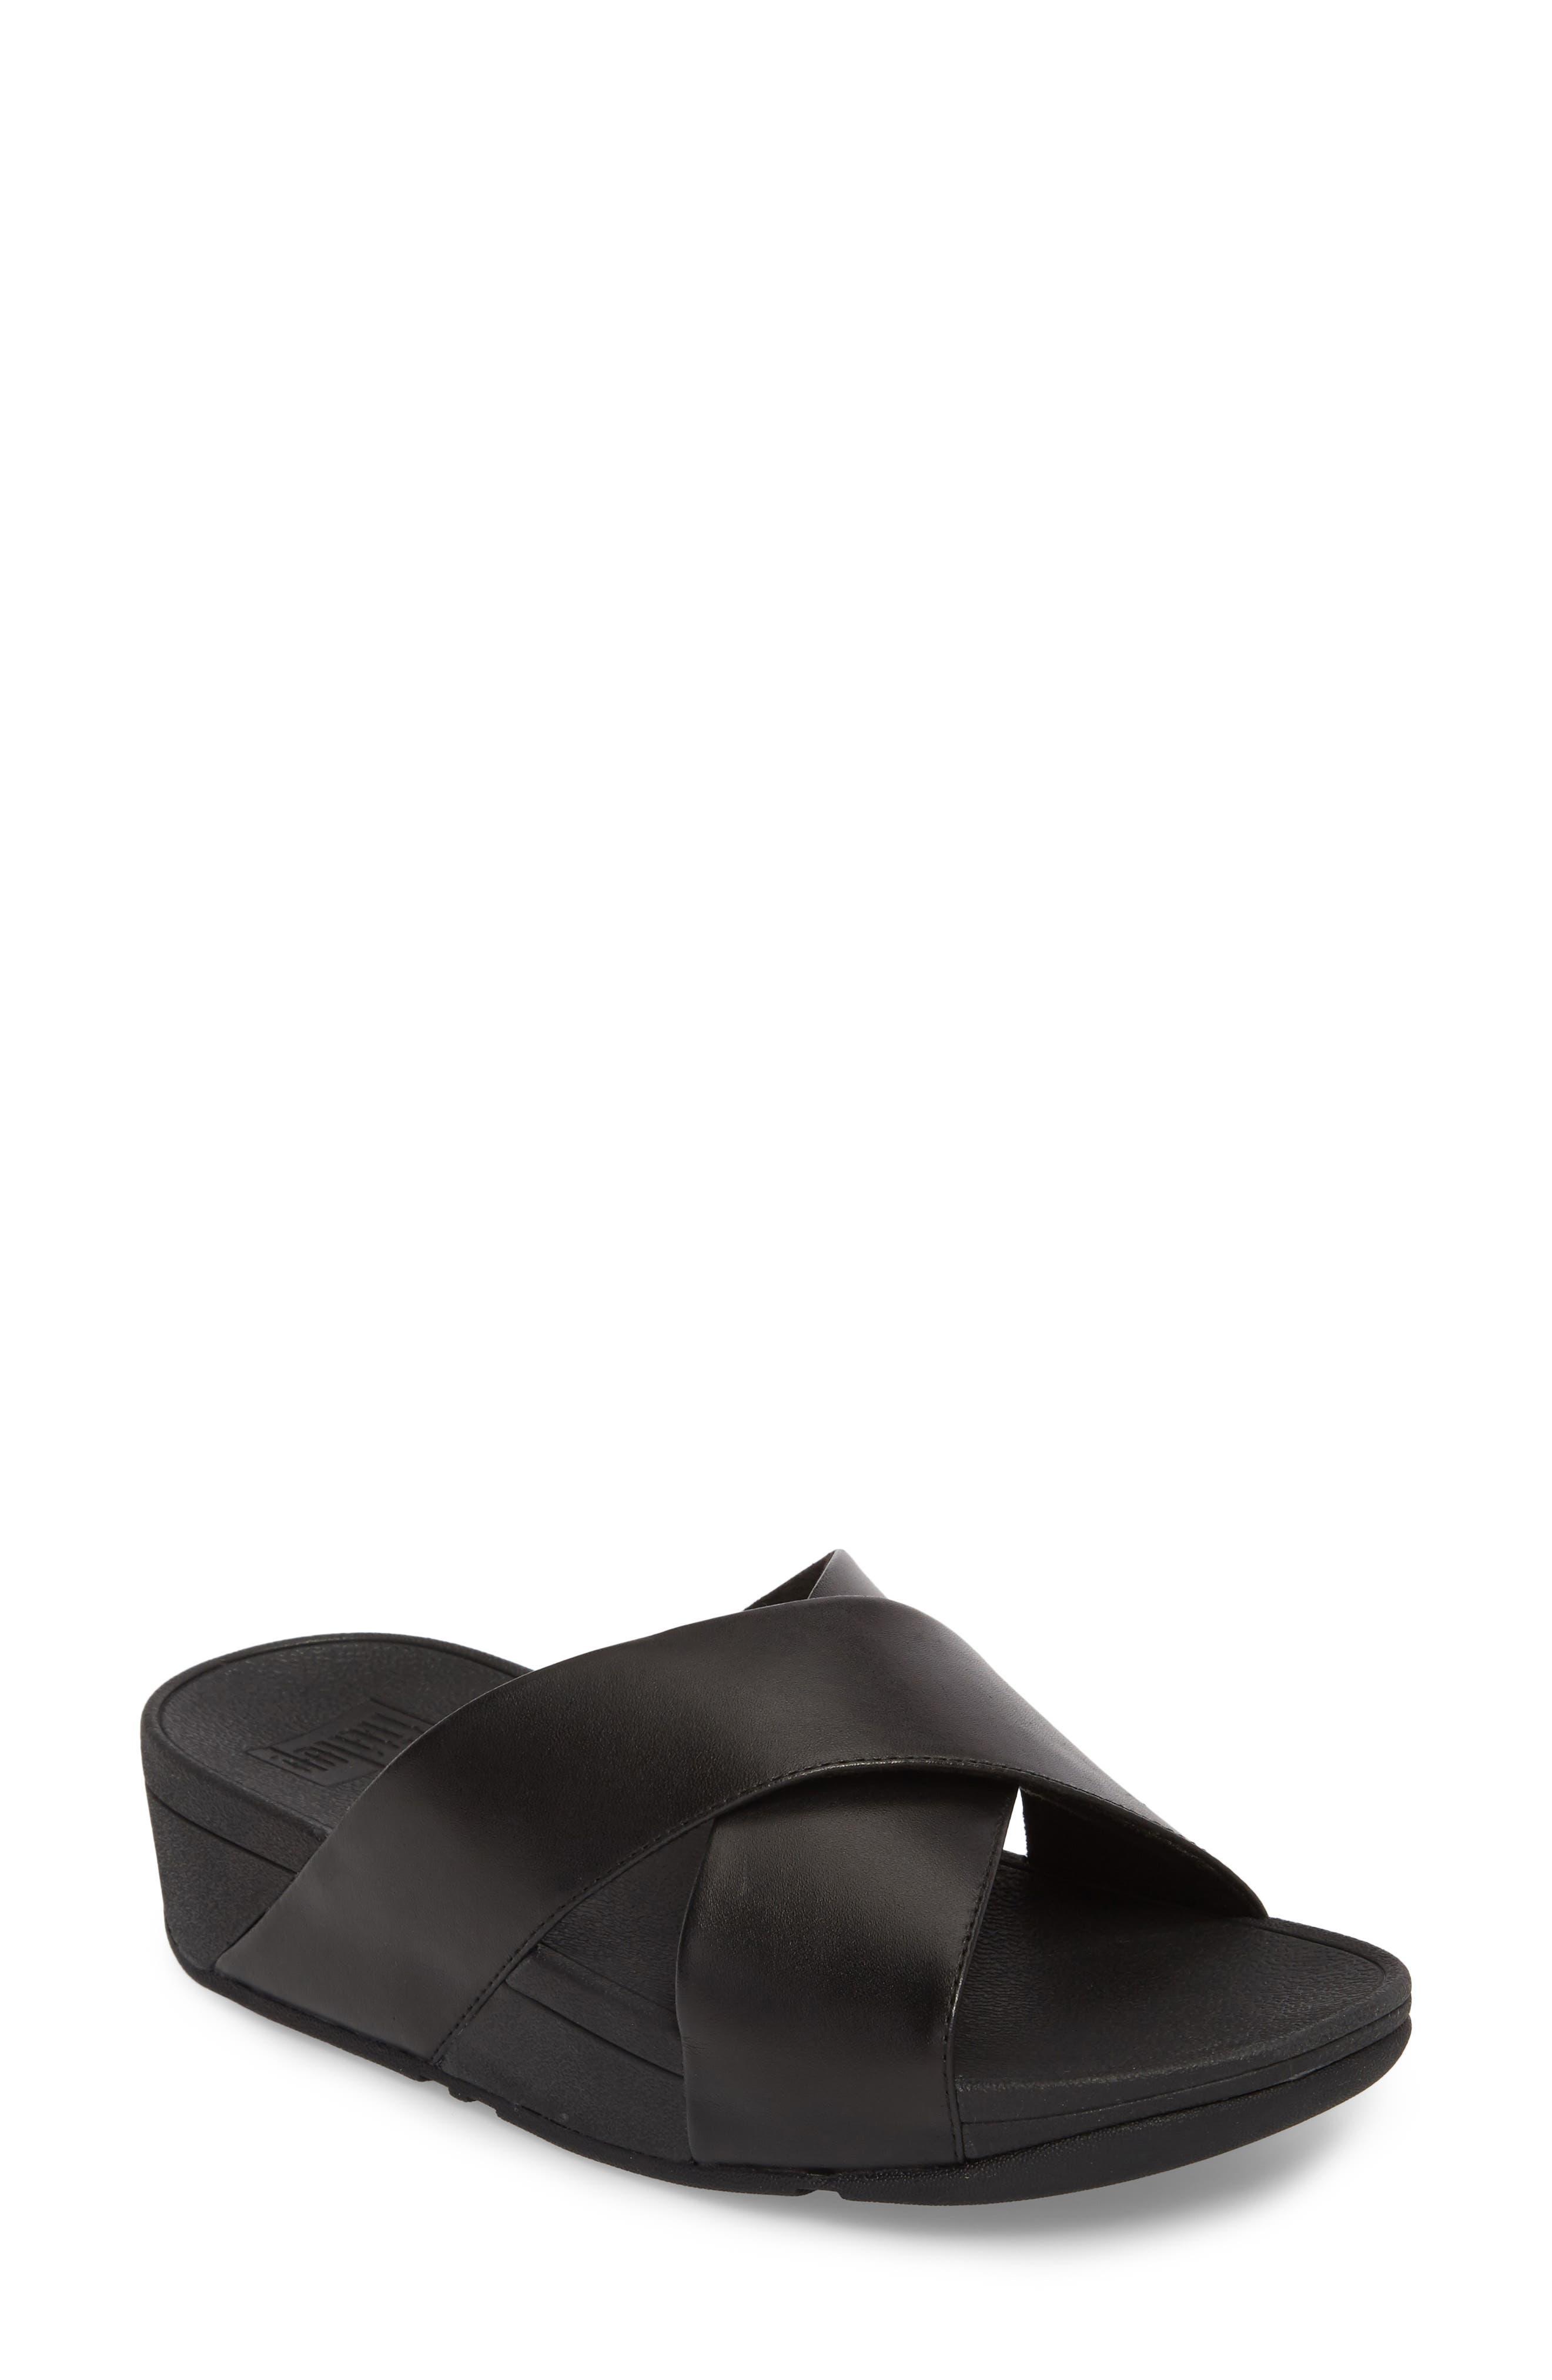 FITFLOP Lulu Cross Slide Sandal, Main, color, 001